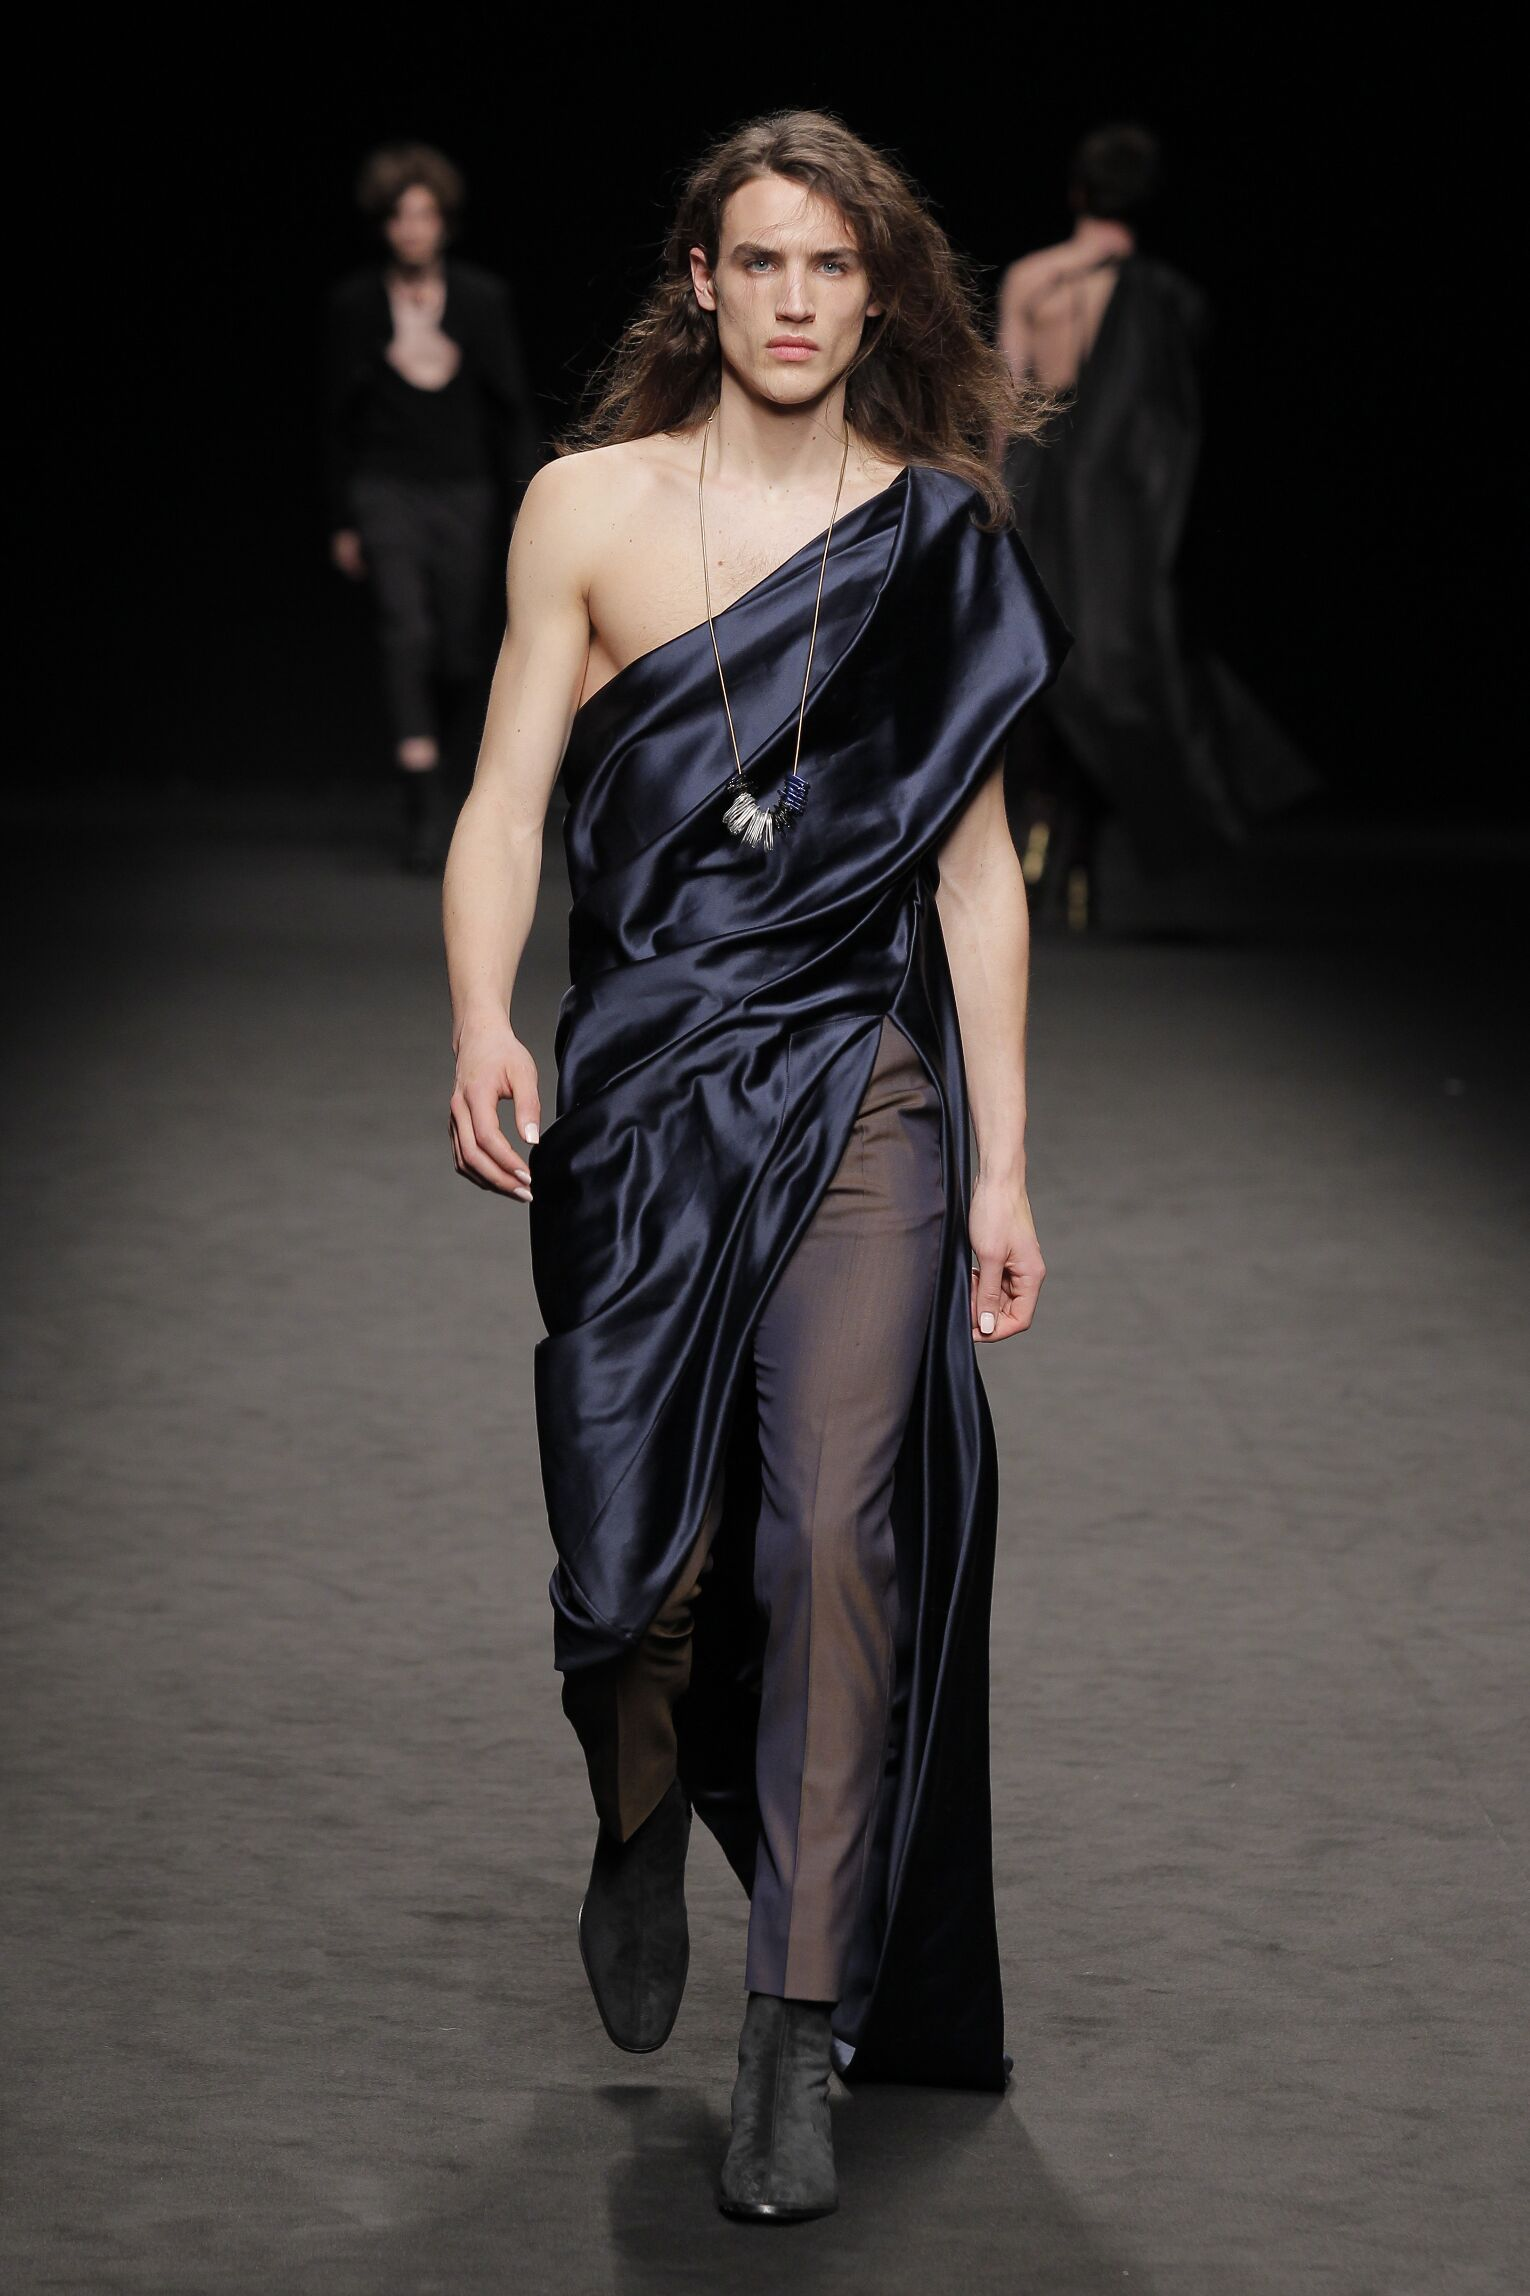 2016 Vivienne Westwood Fall Catwalk